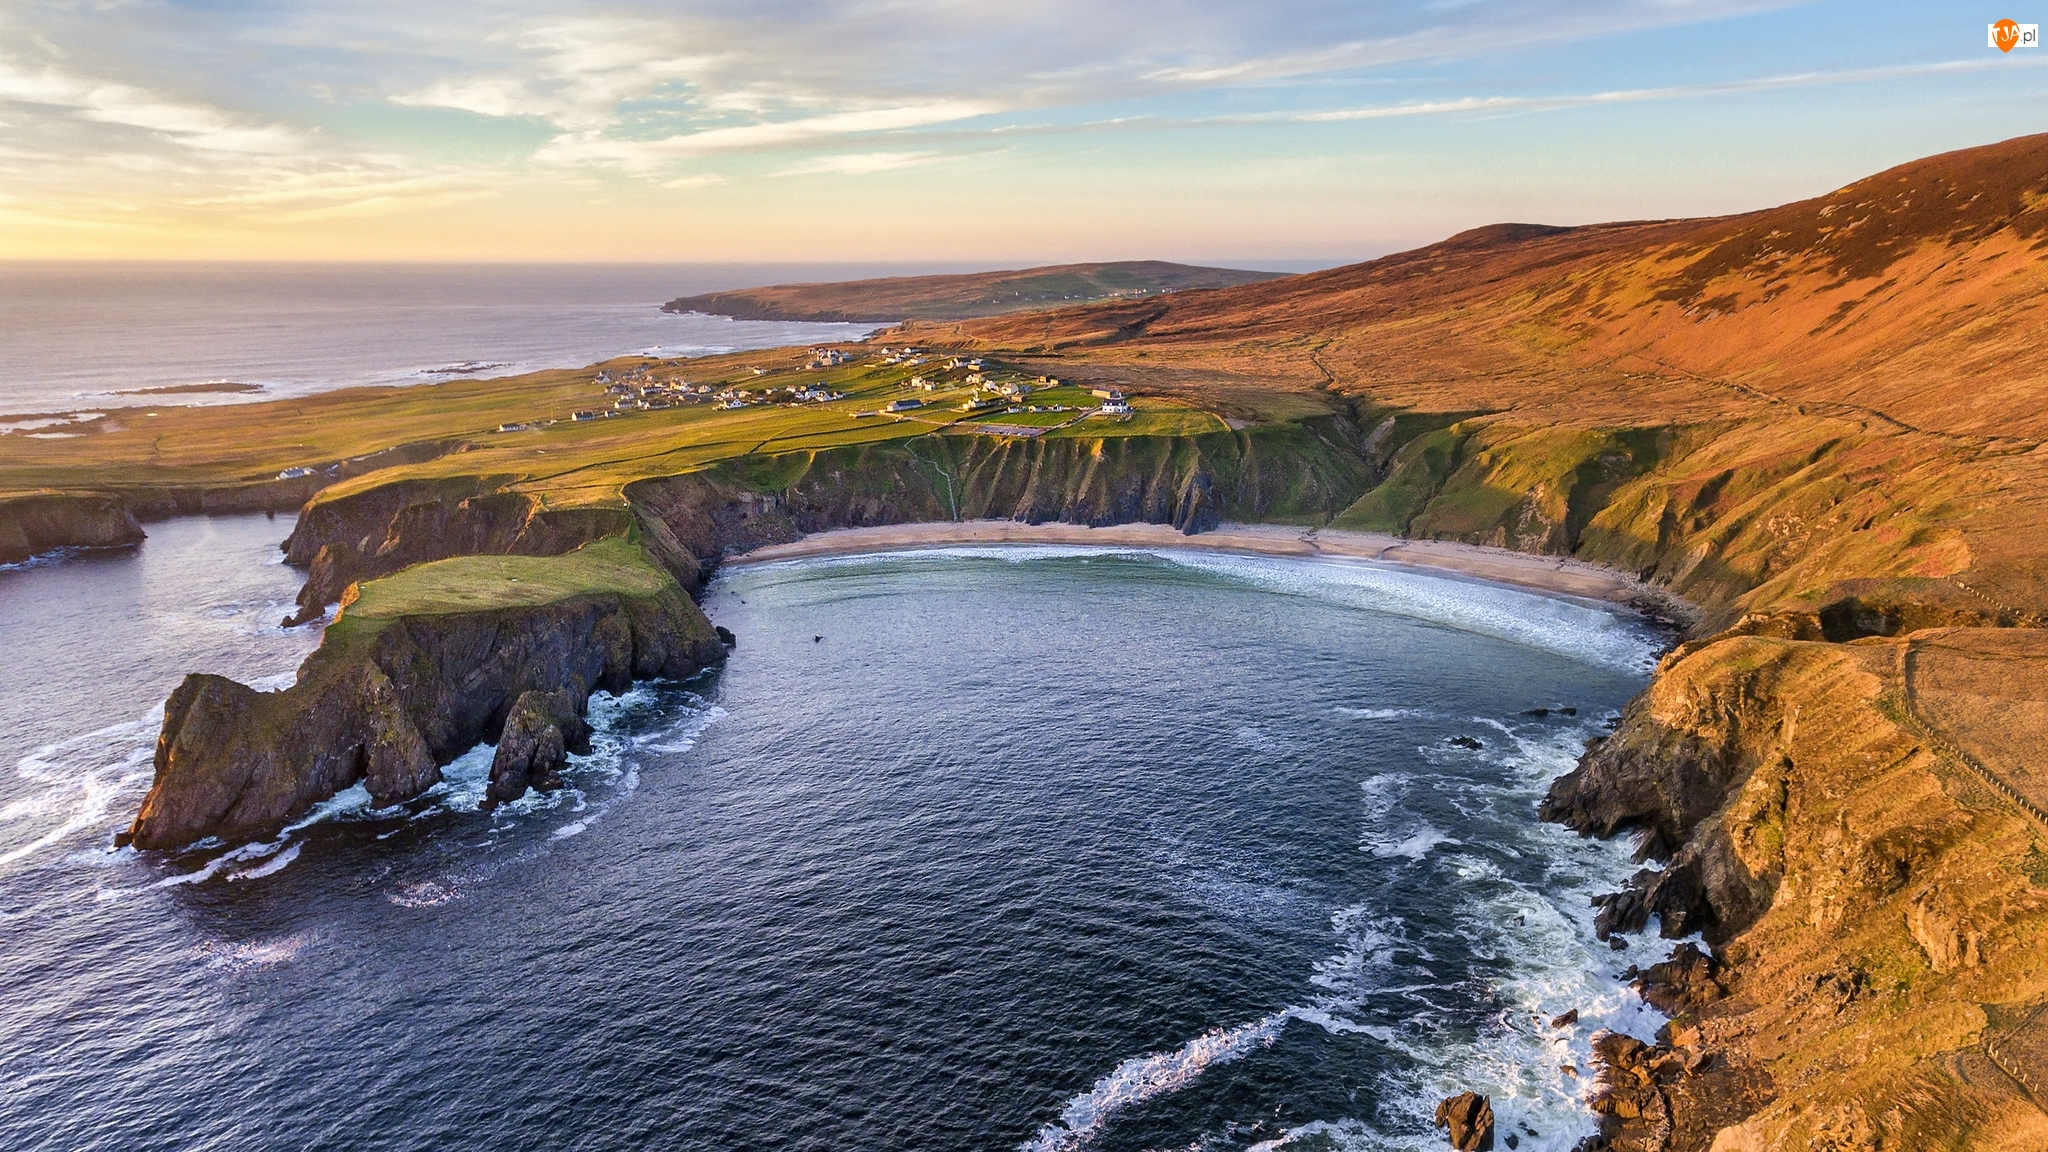 Irlandia, Wybrzeże Glencolmcille, Hrabstwo Donegal, Silver Strand Horseshoe Beach, Malin Beg, Klify, Zatoka, Morze, Plaża